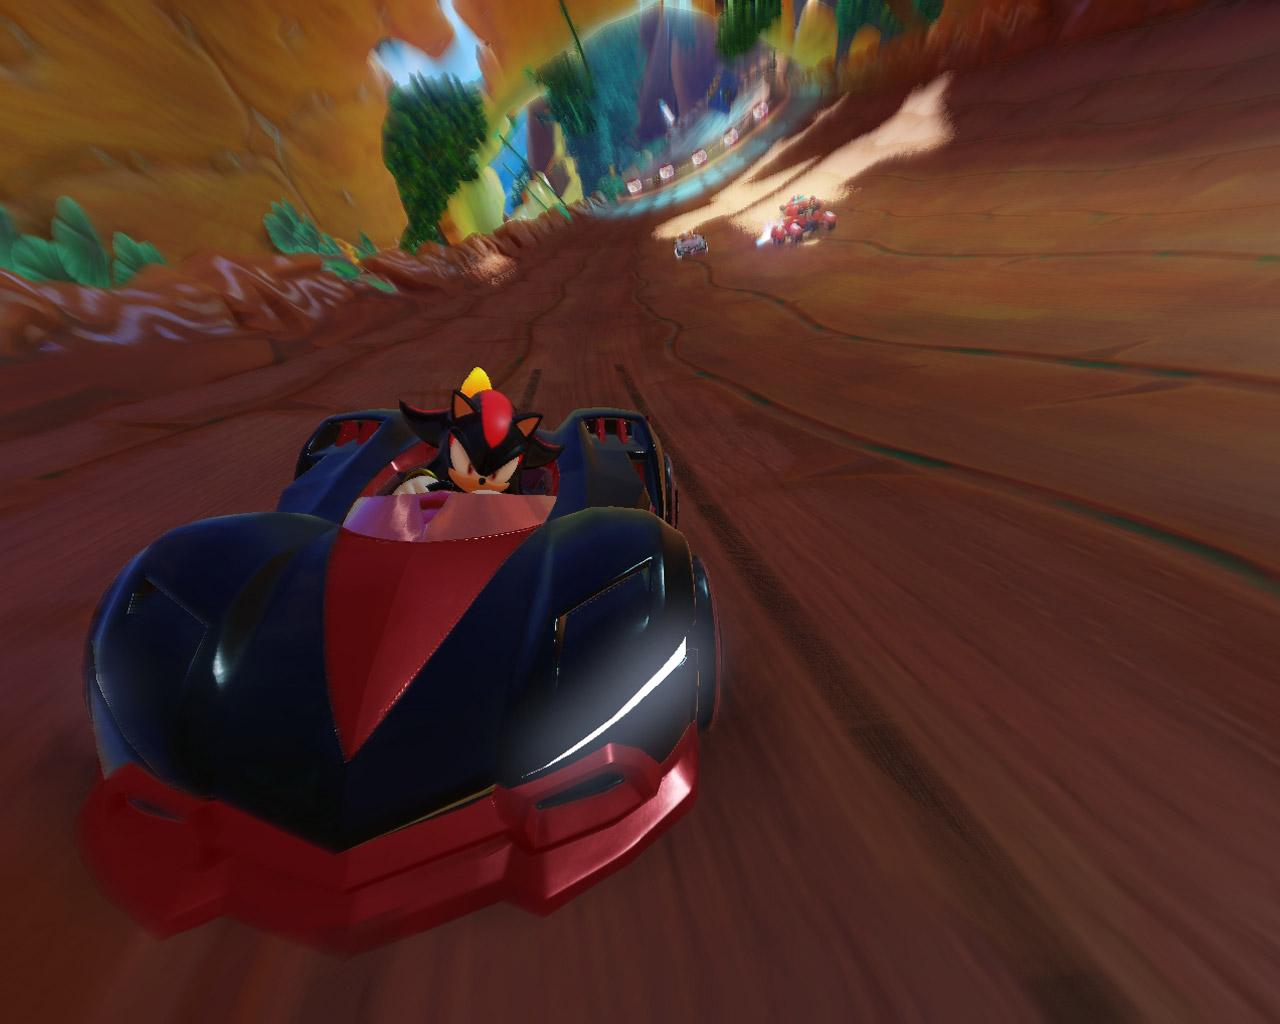 Free Team Sonic Racing Wallpaper in 1280x1024